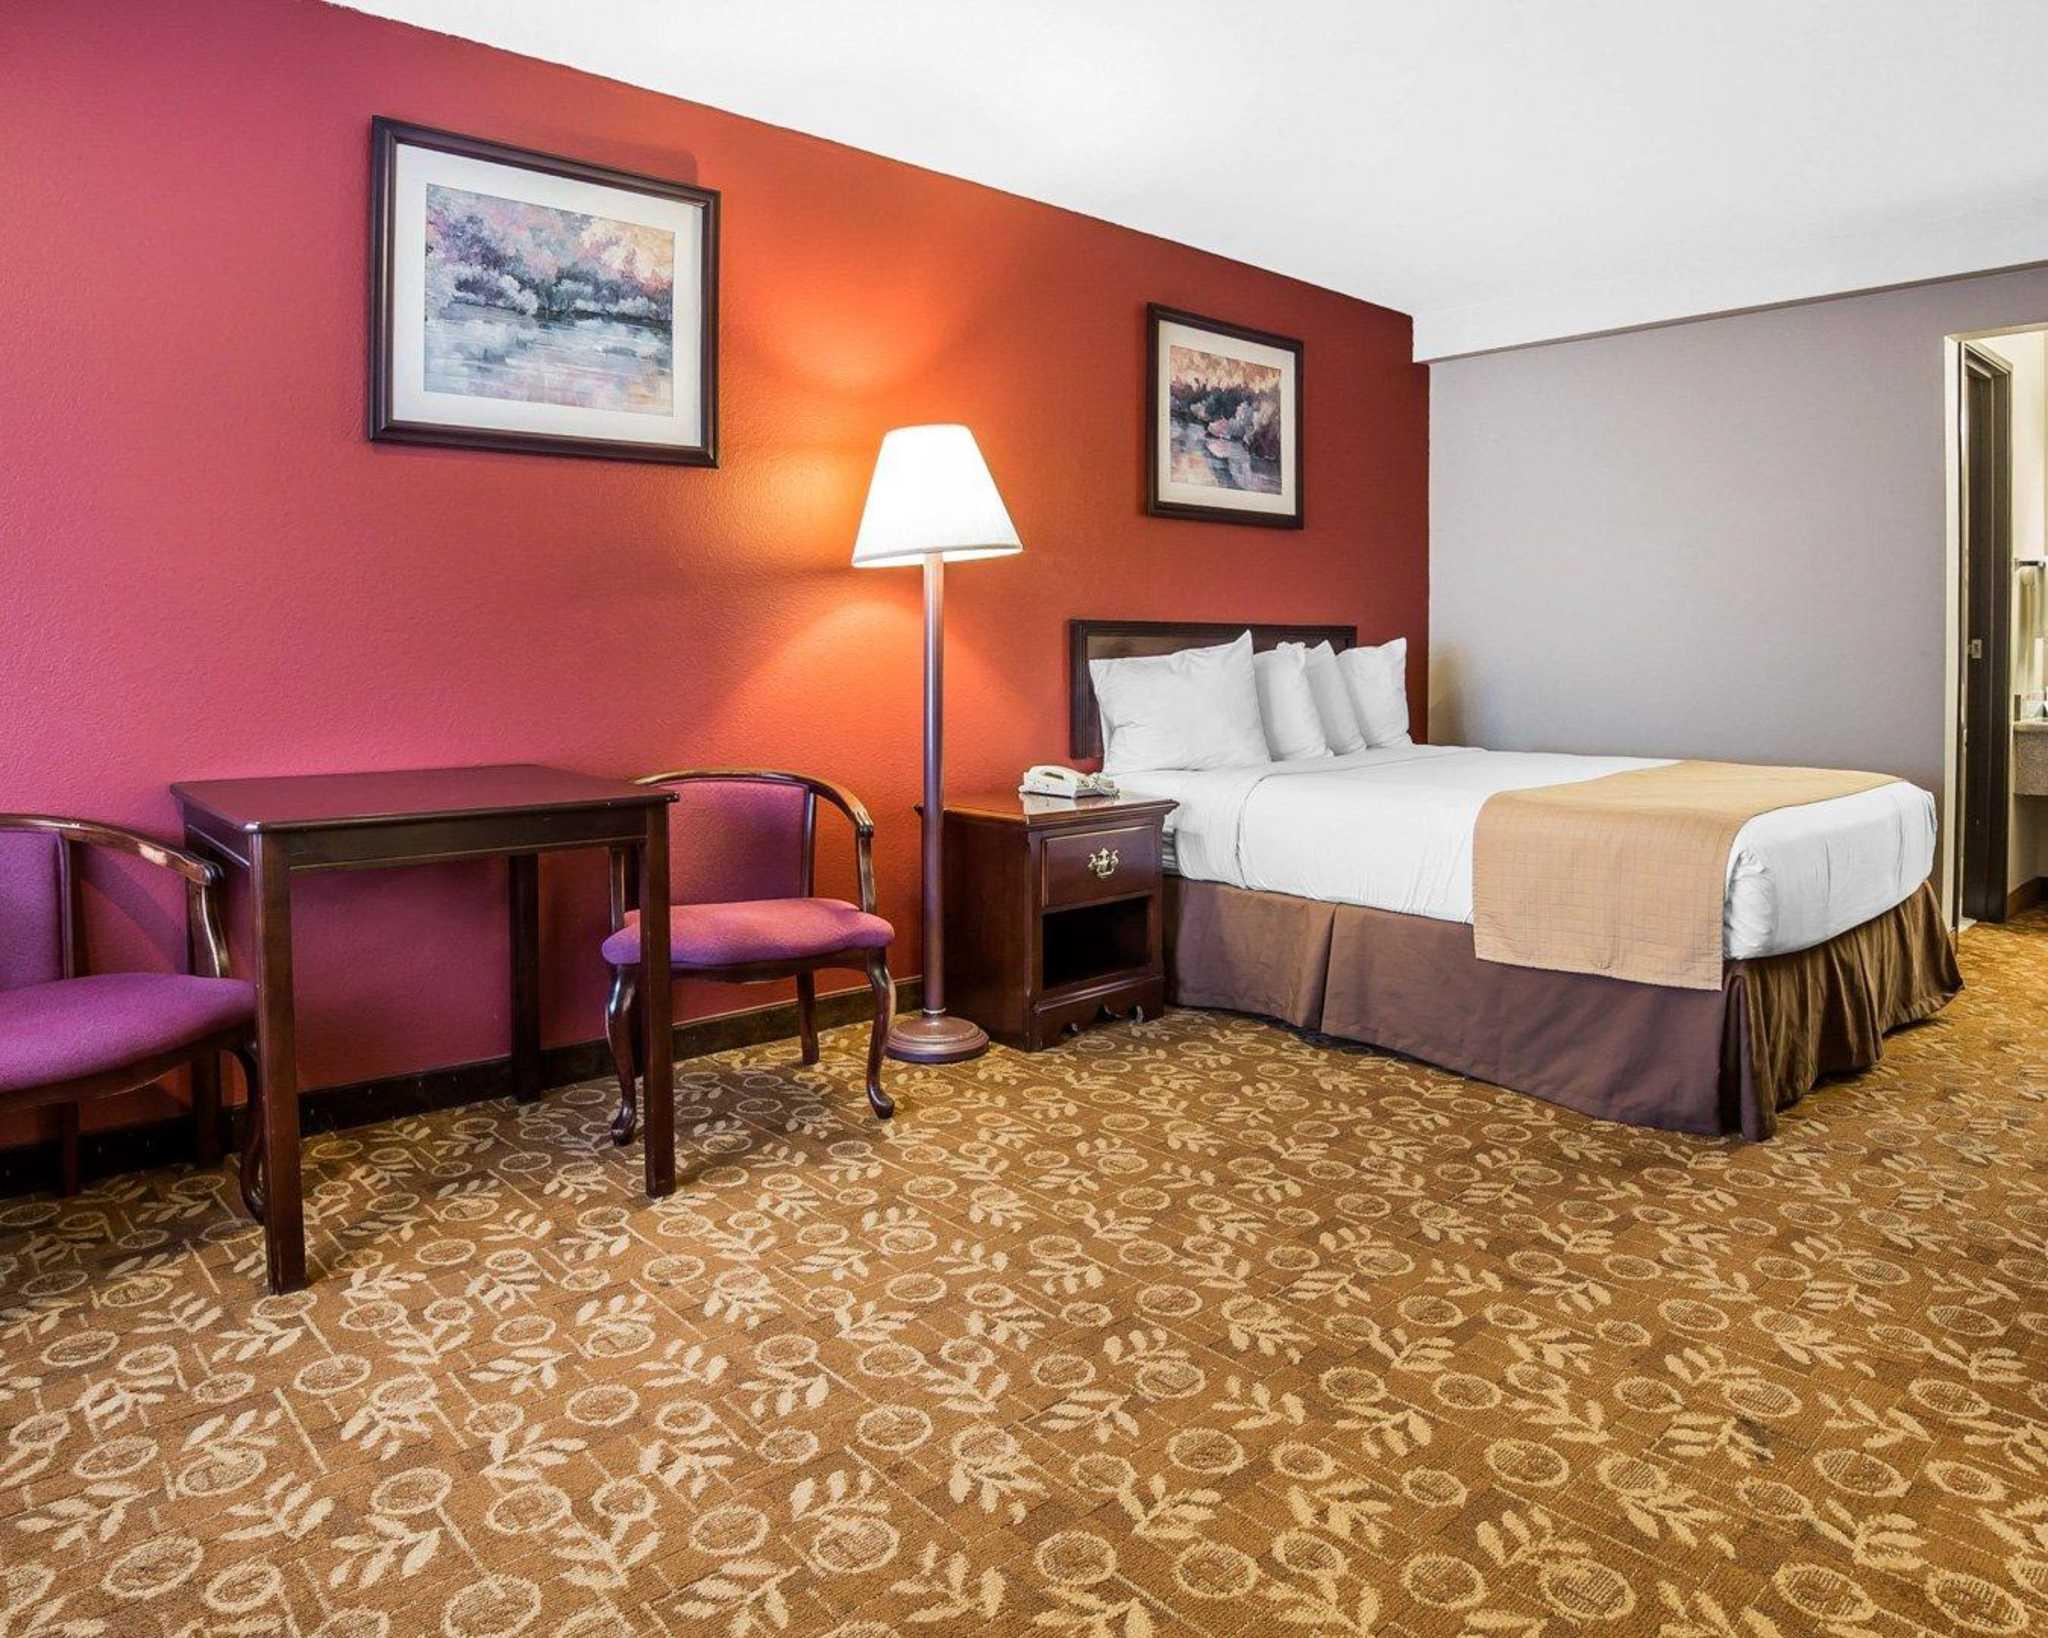 Quality Inn & Suites Minden US-395 image 14